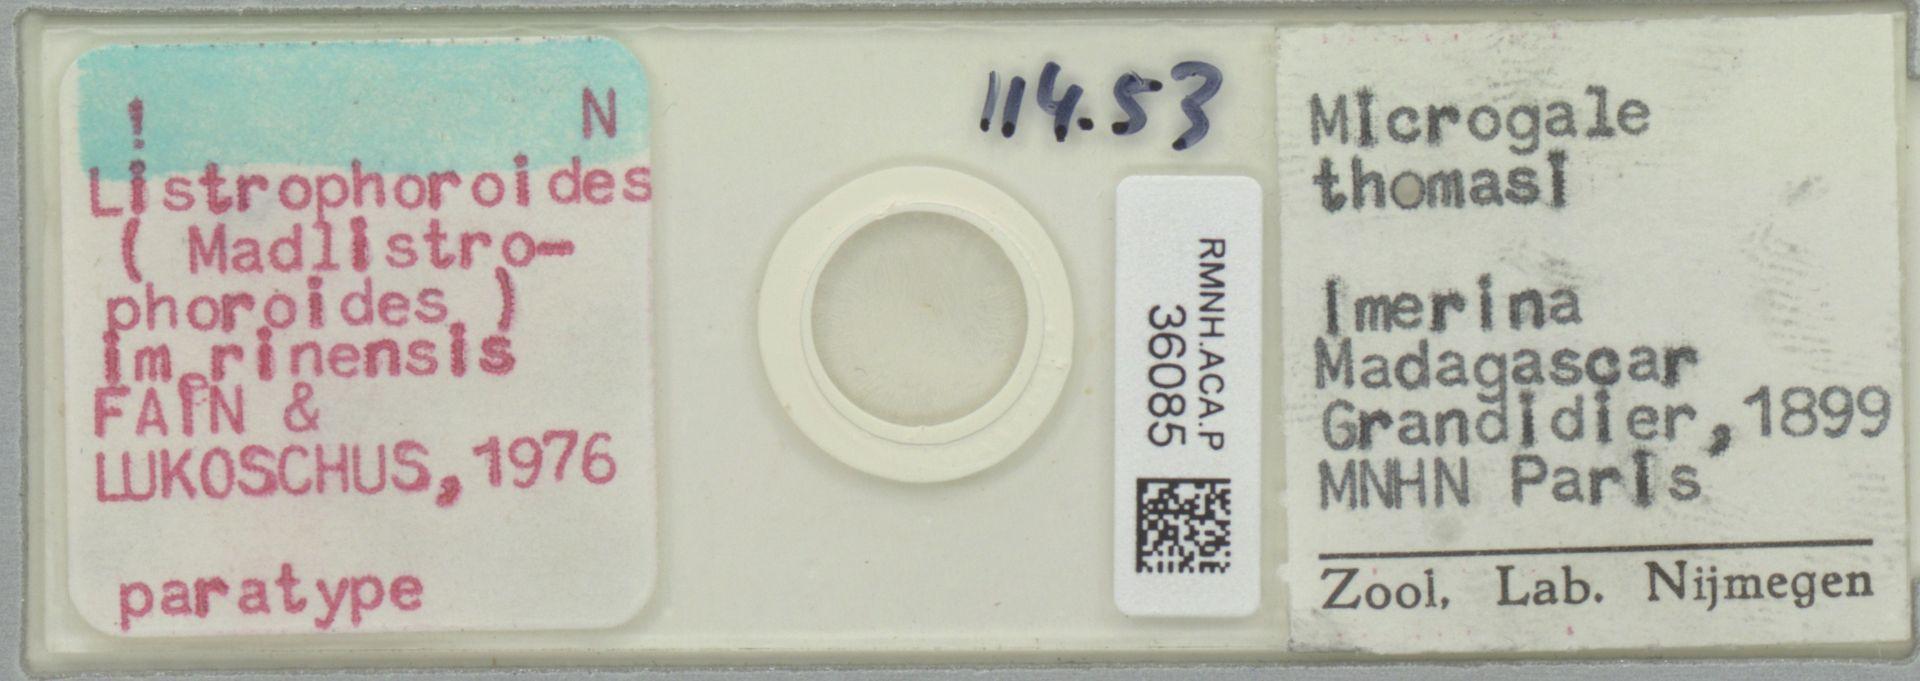 RMNH.ACA.P.36085 | Listrophoroides (Madlistrophoroides) imerinensis Fain & Lukoschus 1976